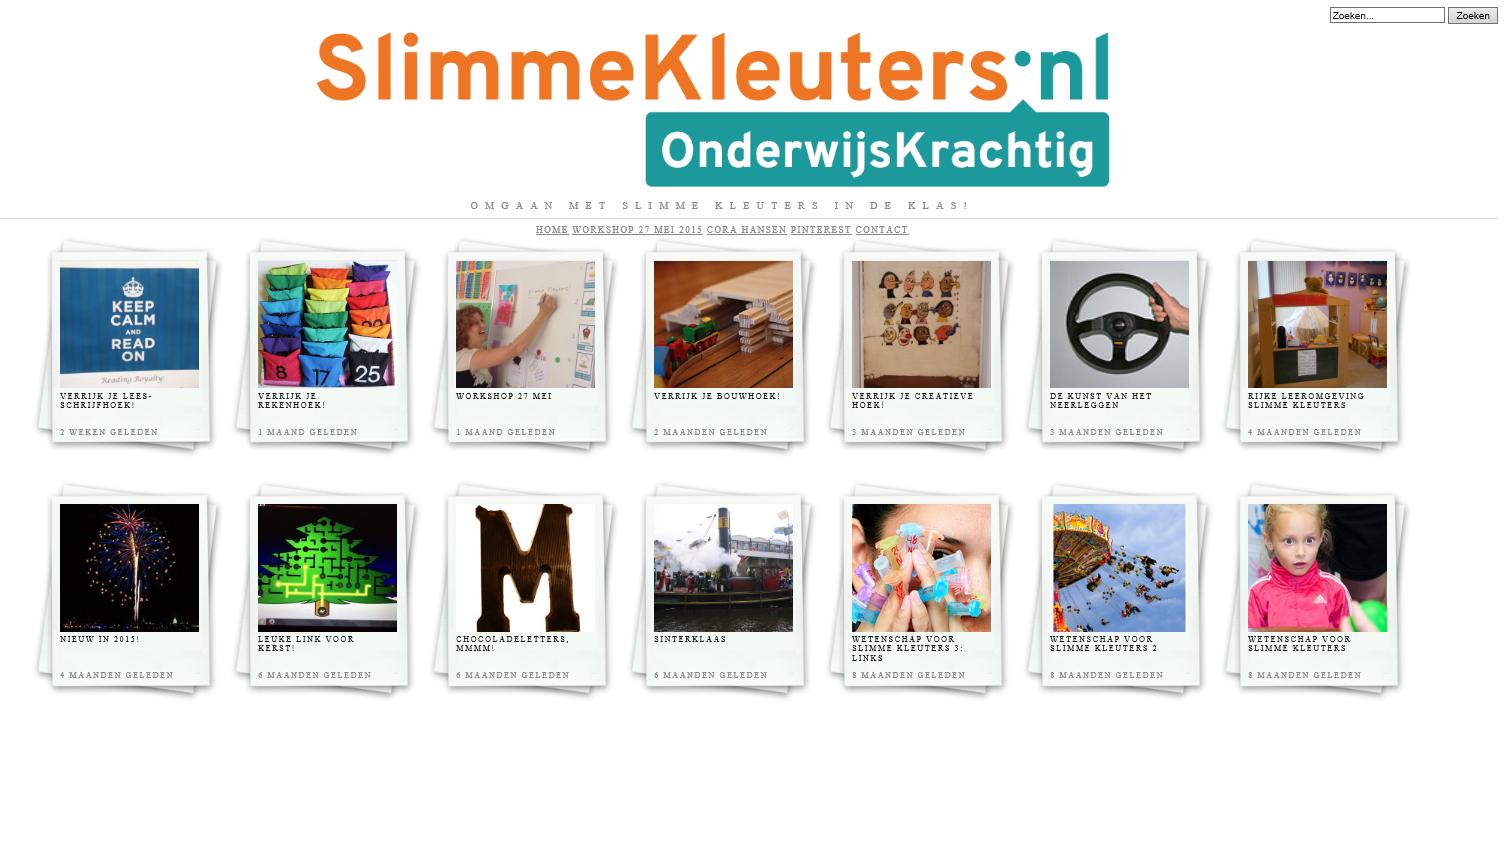 slimme kleuters.nl